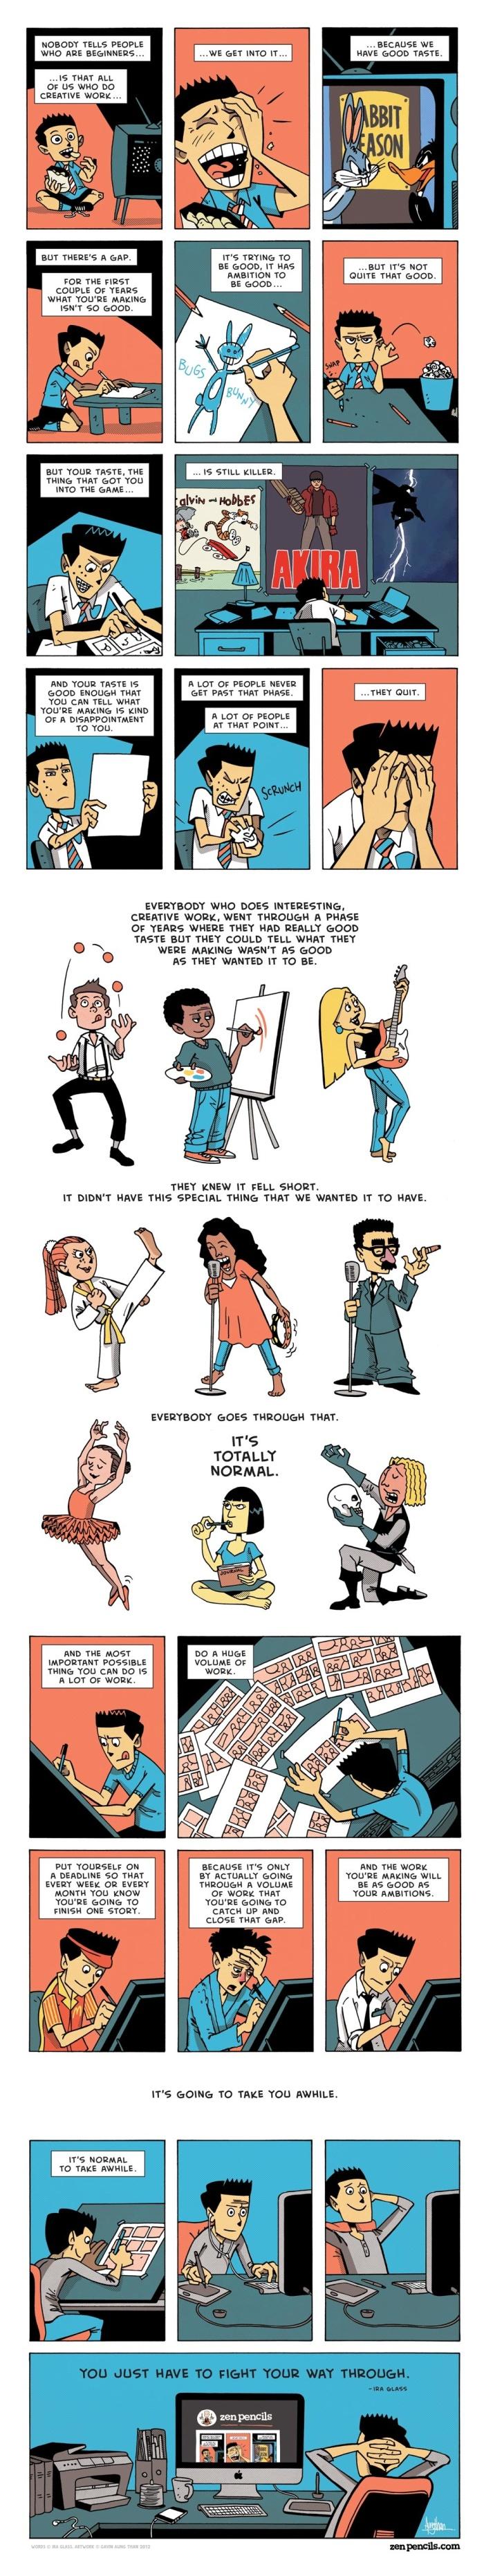 creativity illustrated from illustration inspiration